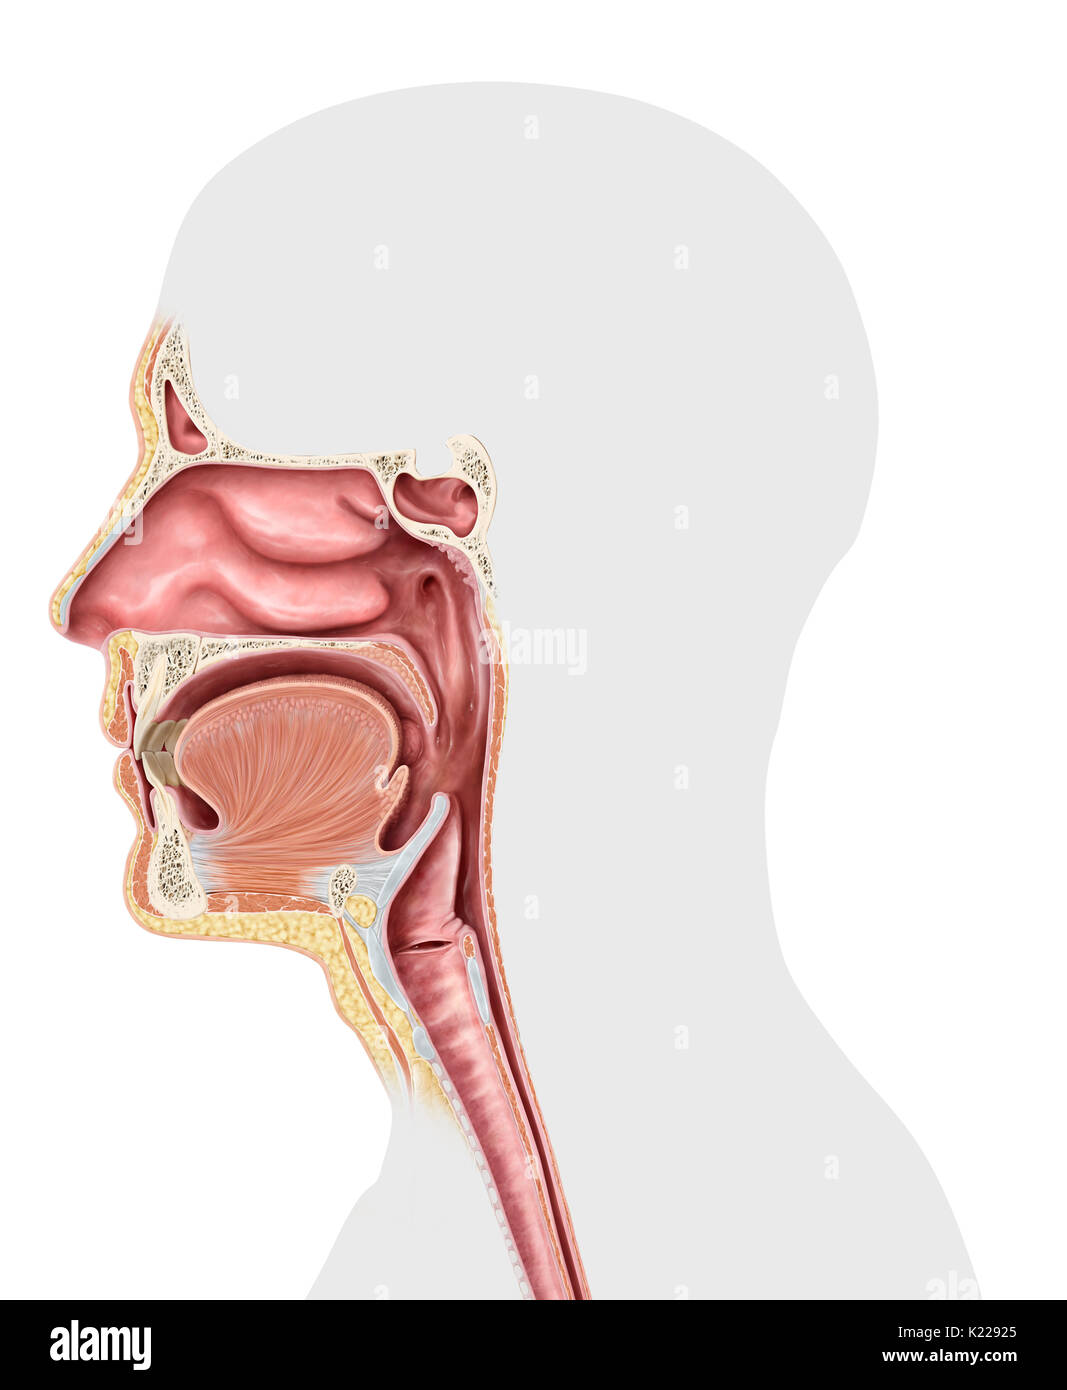 Sinuses Stock Photos & Sinuses Stock Images - Alamy